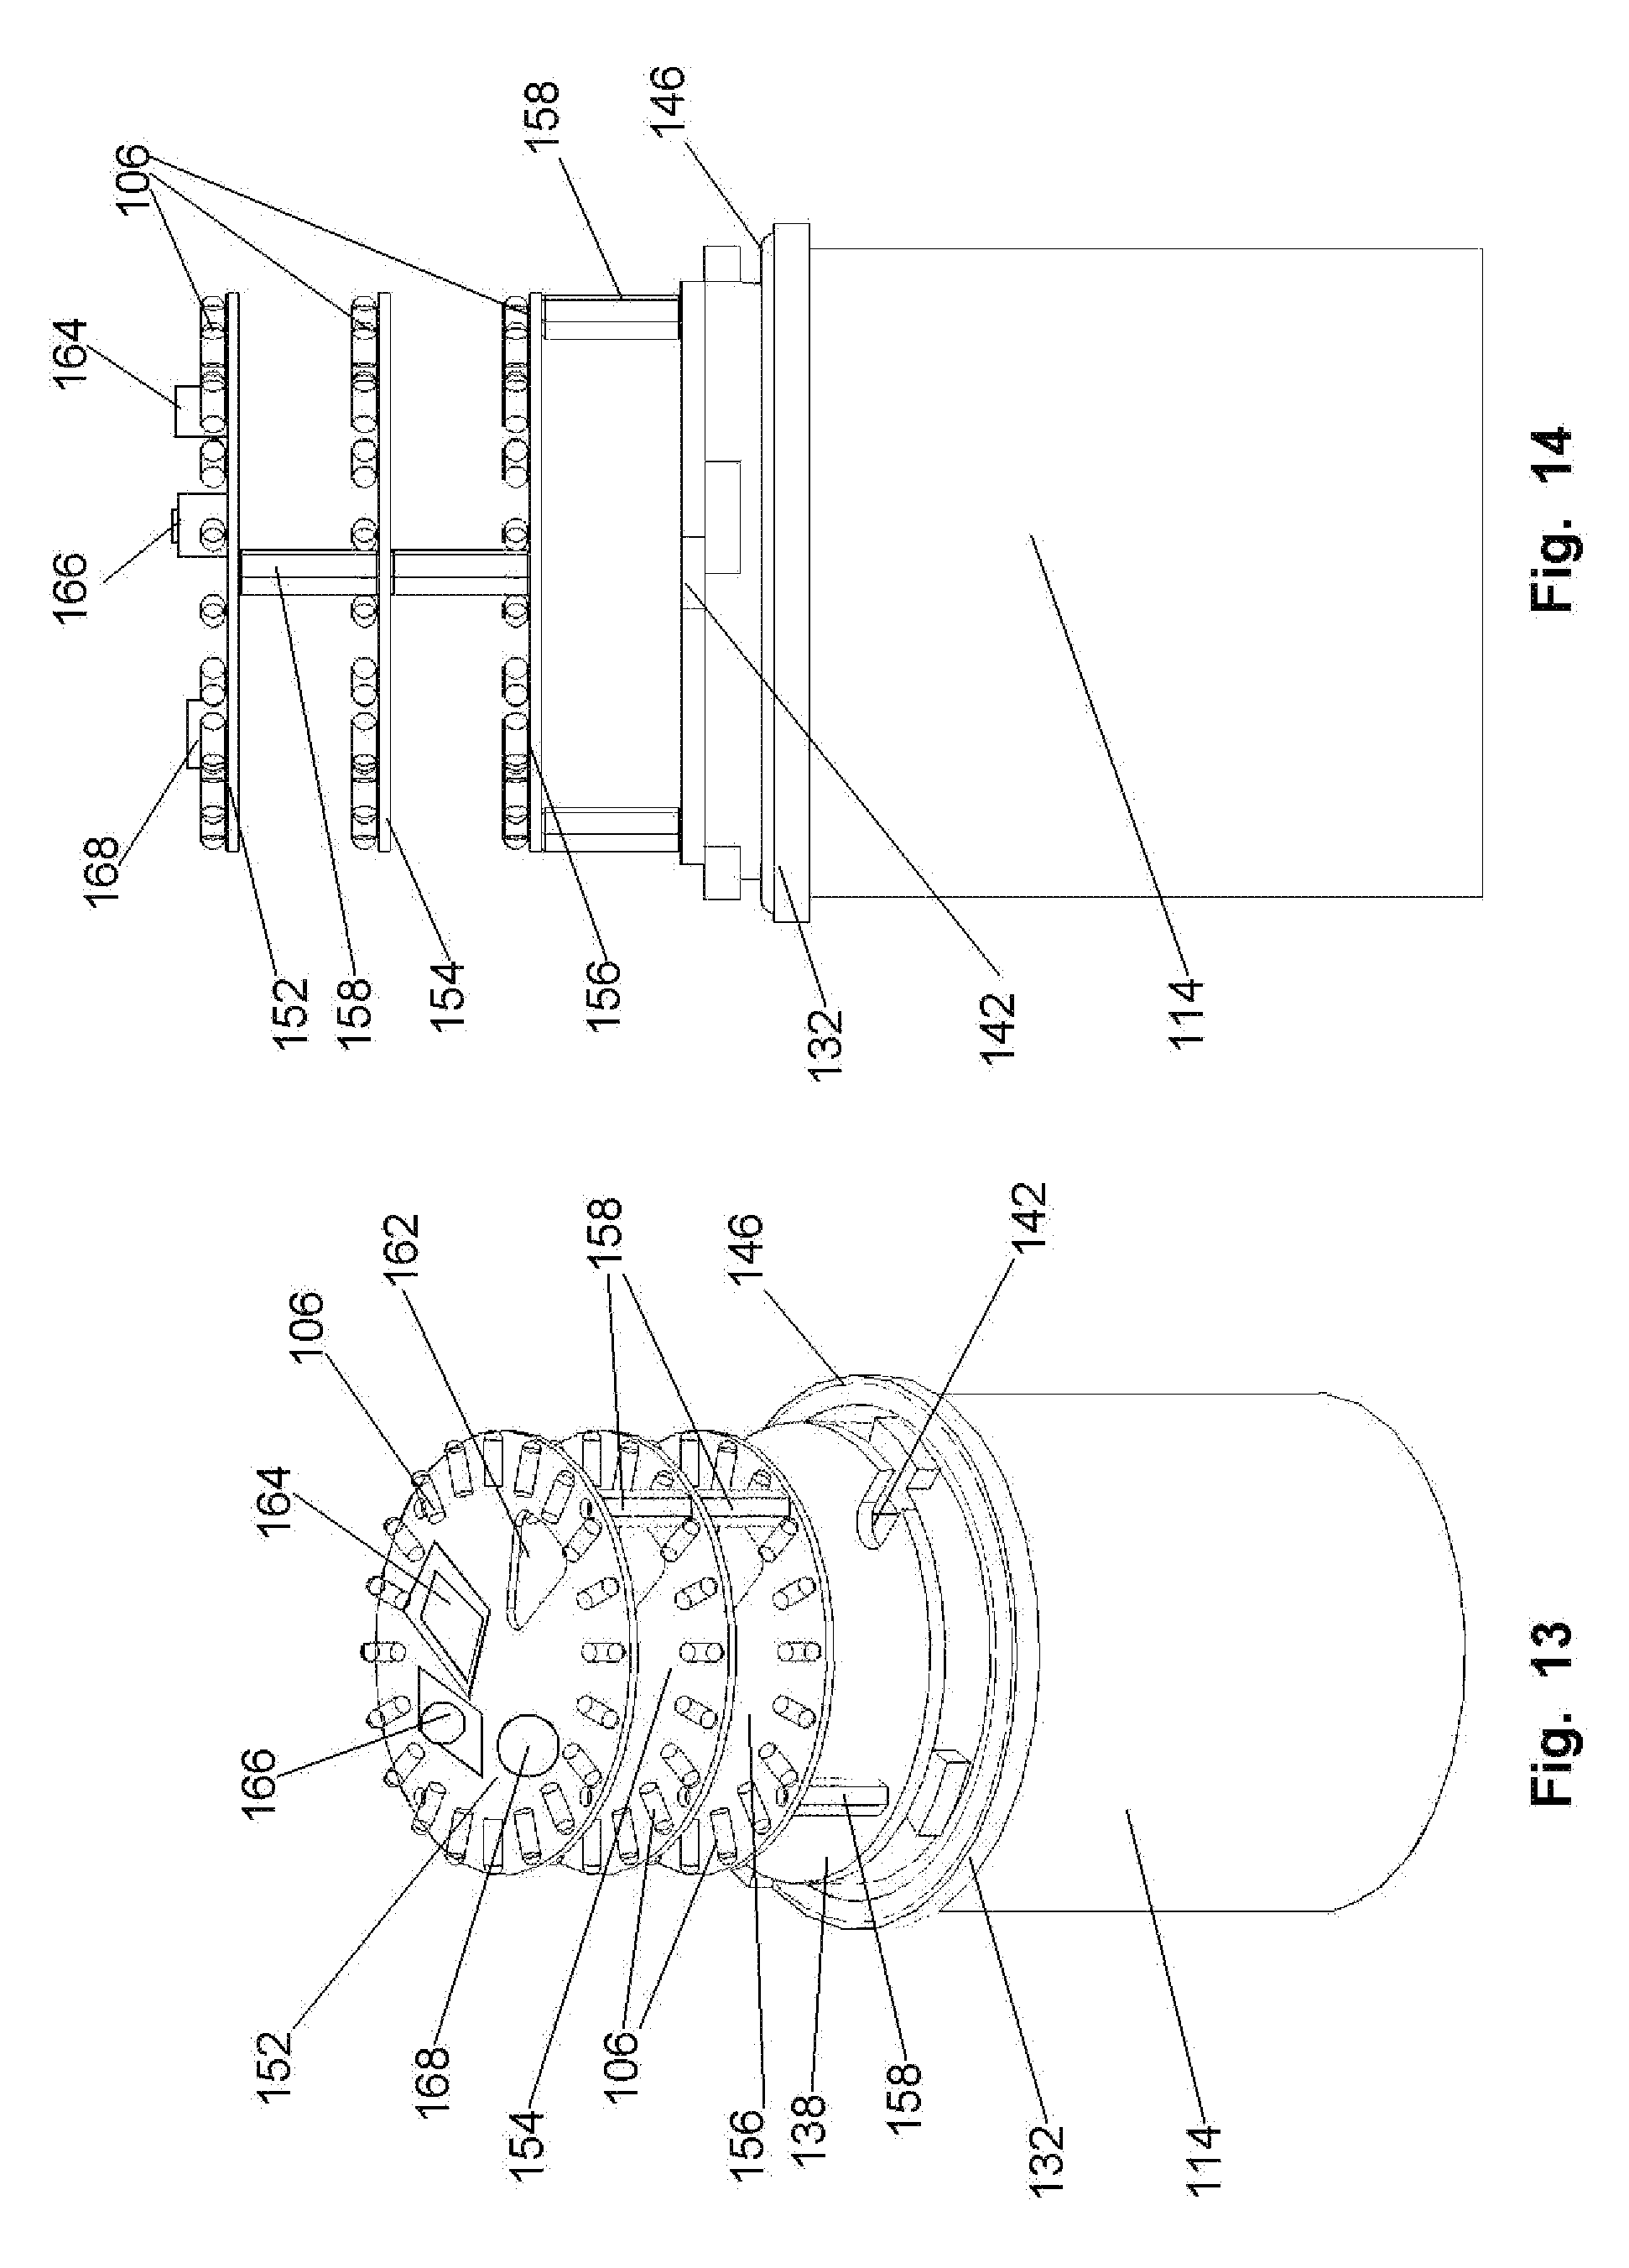 patente us7997764